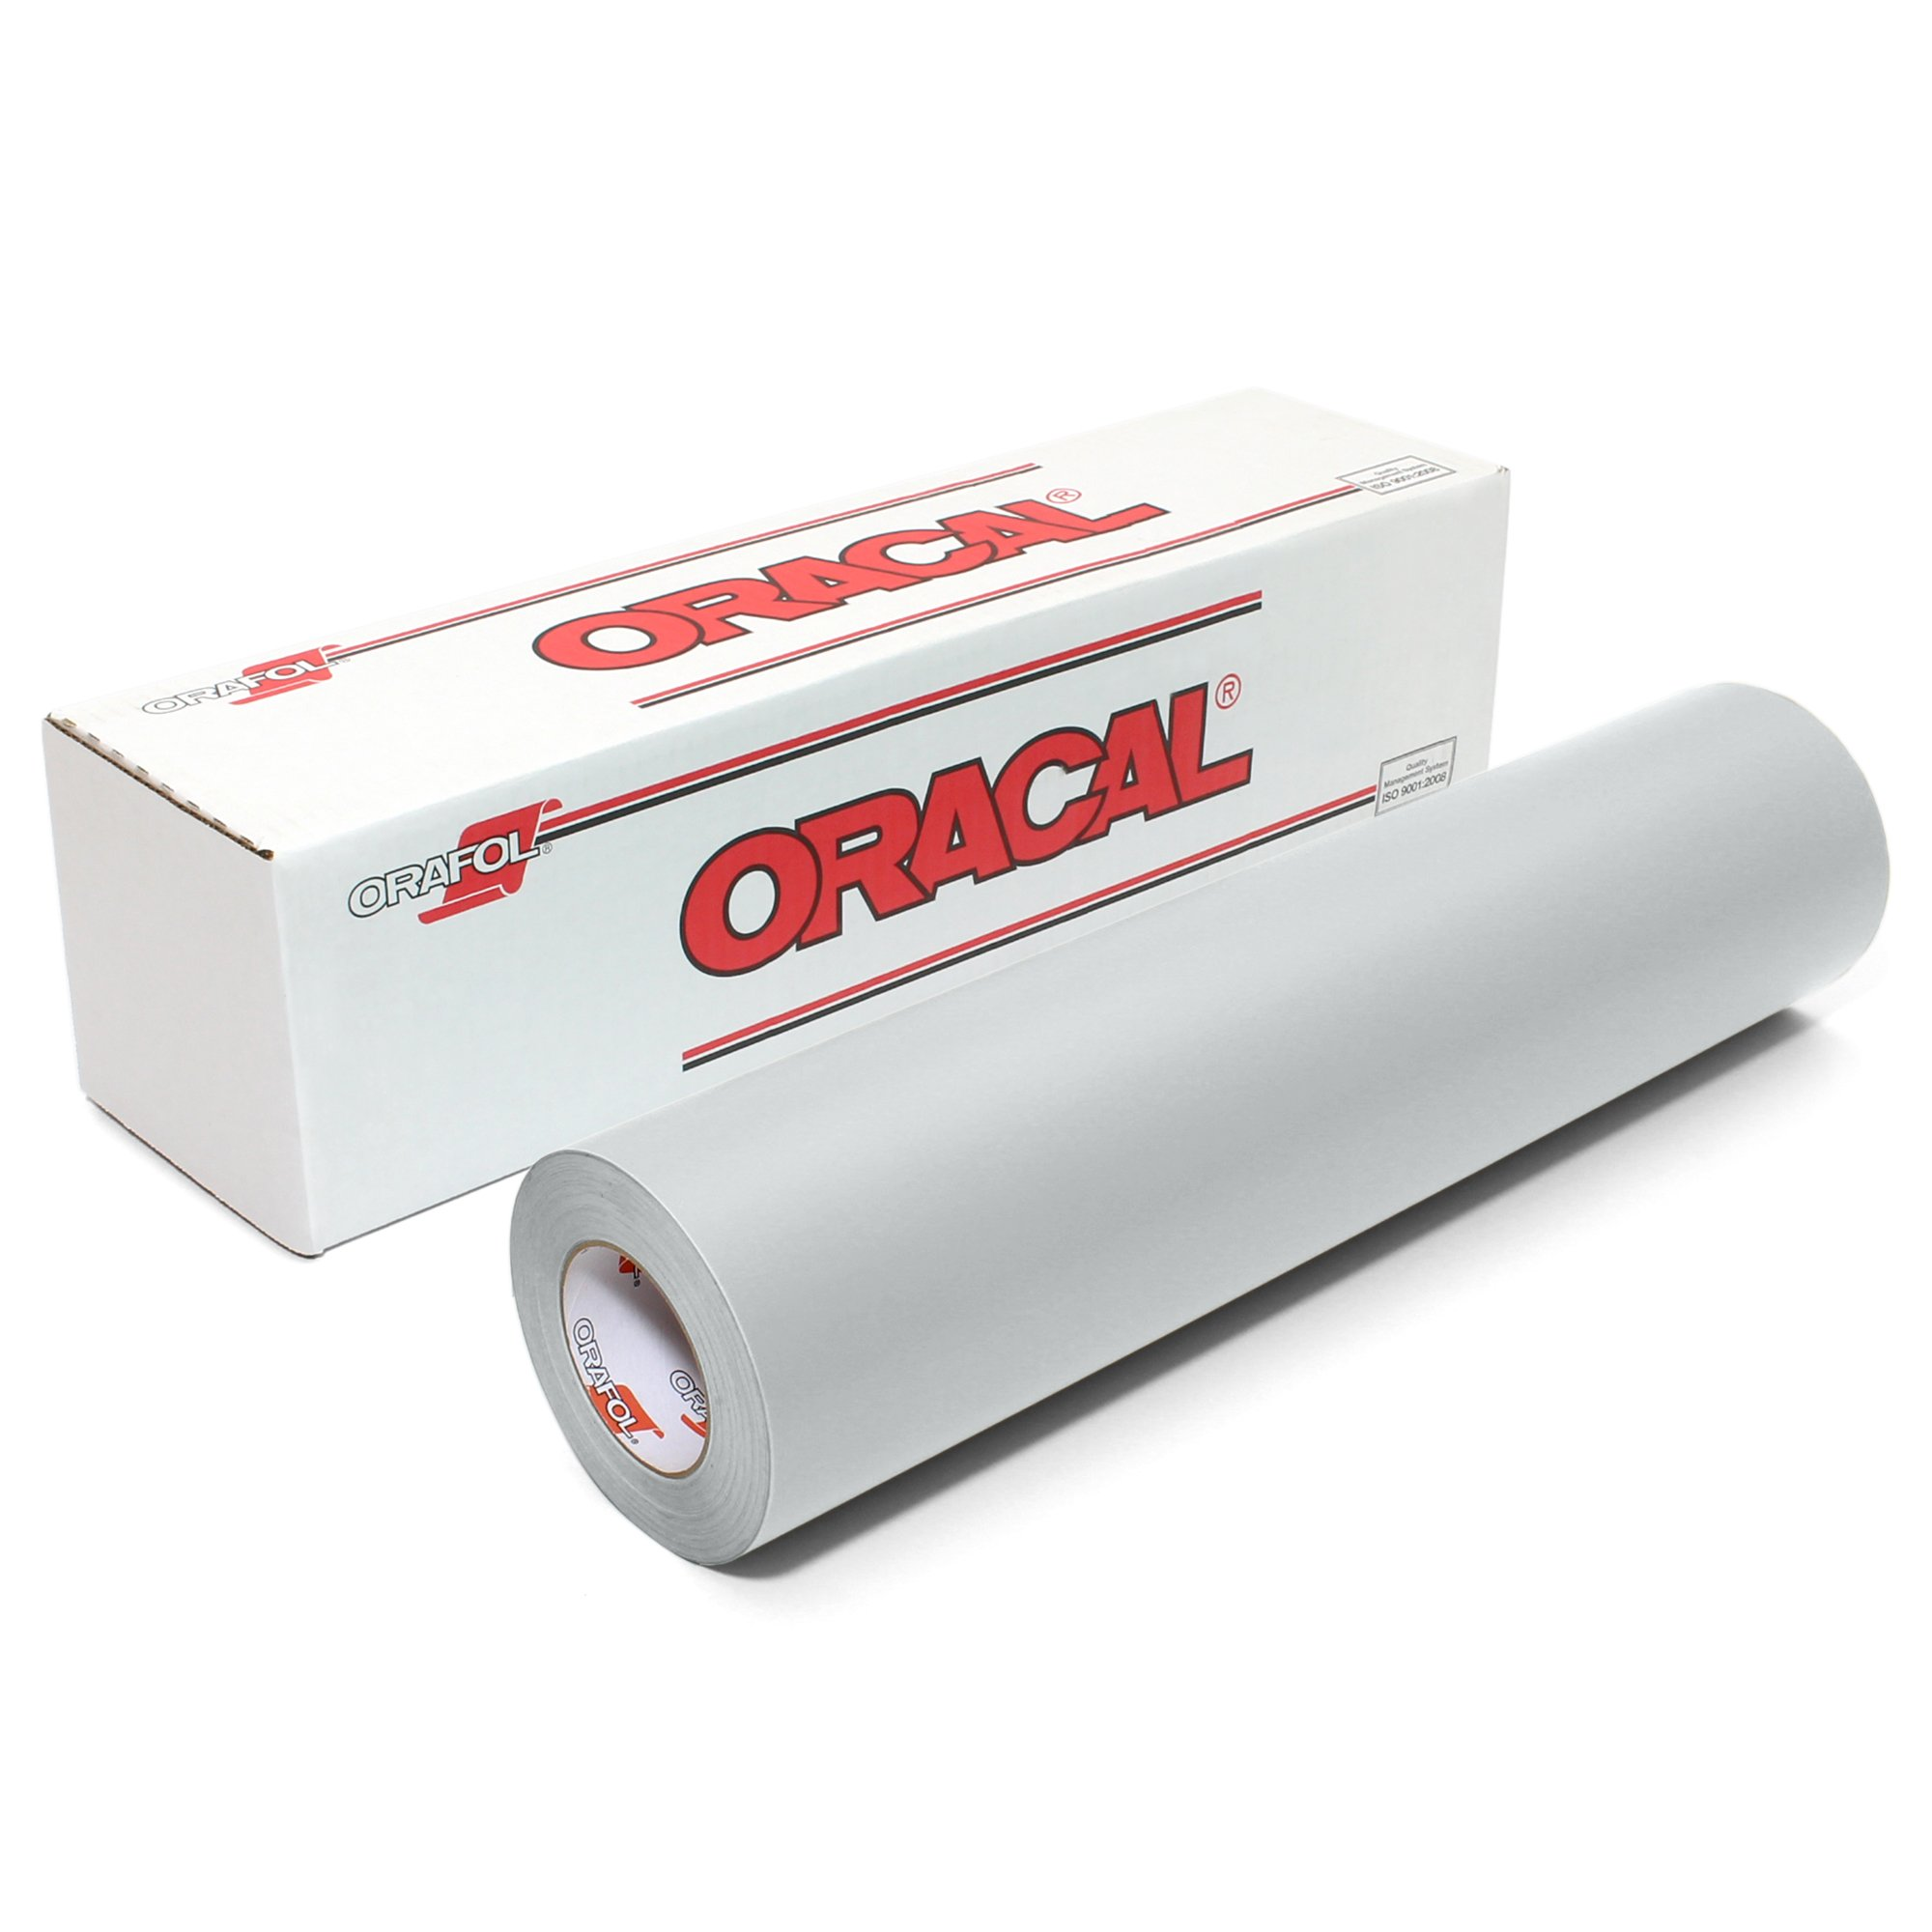 Oracal 631 Matte Vinyl Roll 24 Inches by 150 Feet - Light Grey